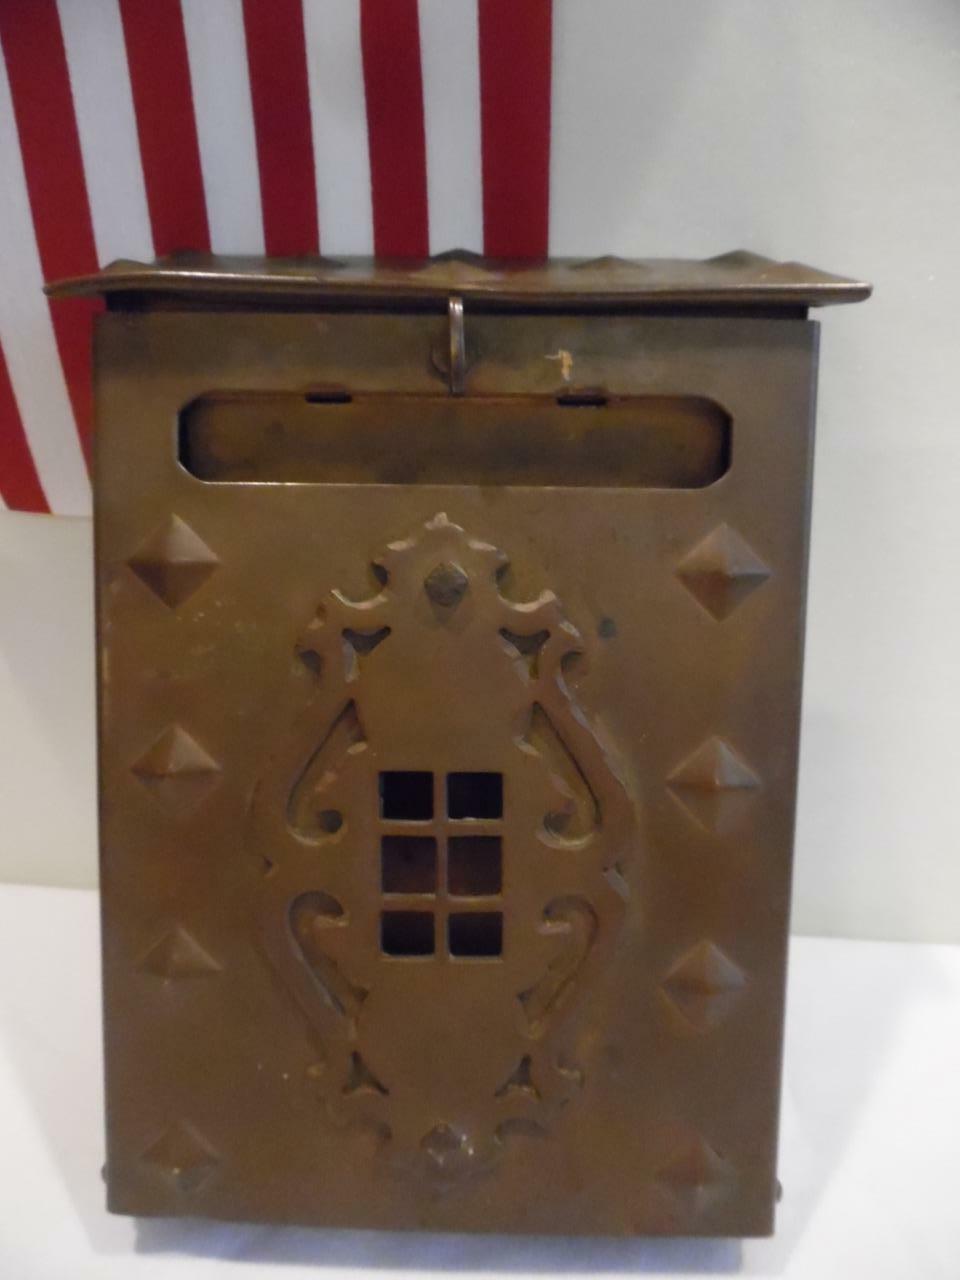 Naiture Brass Locking Wall-Mount Mailbox in Antique Brass Finish